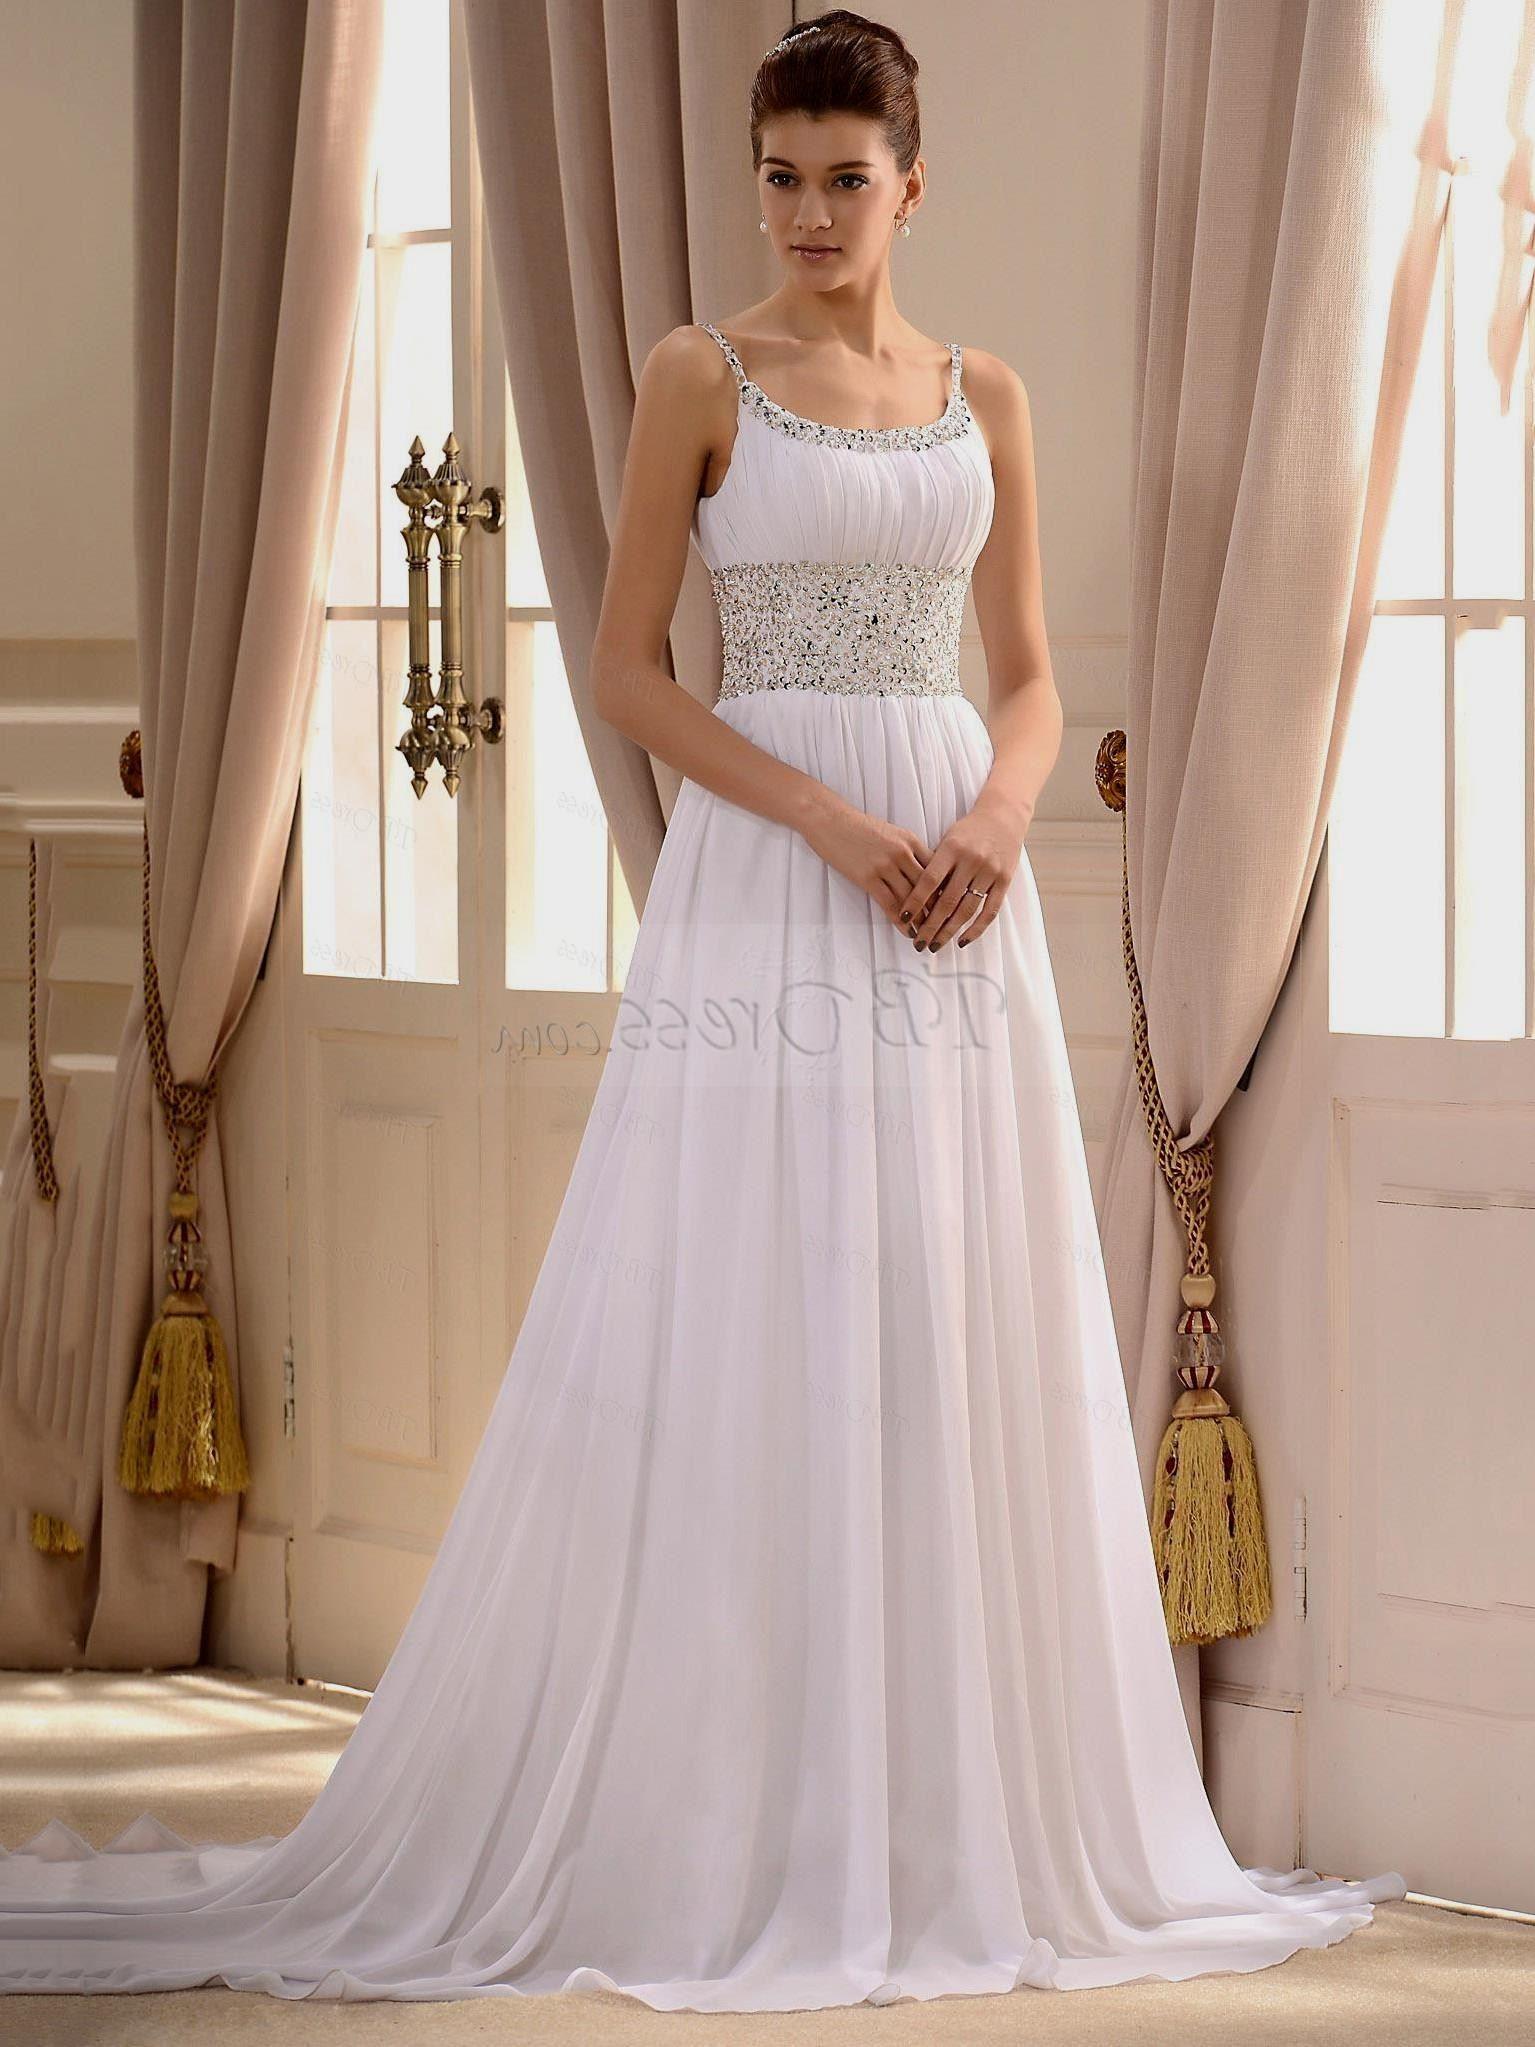 49 Beautiful Wedding Dresses For Beach Wedding Pics Wedding Dress Gallery Short Wedding Gowns Simple Wedding Dress Beach Beautiful Bridal Dresses